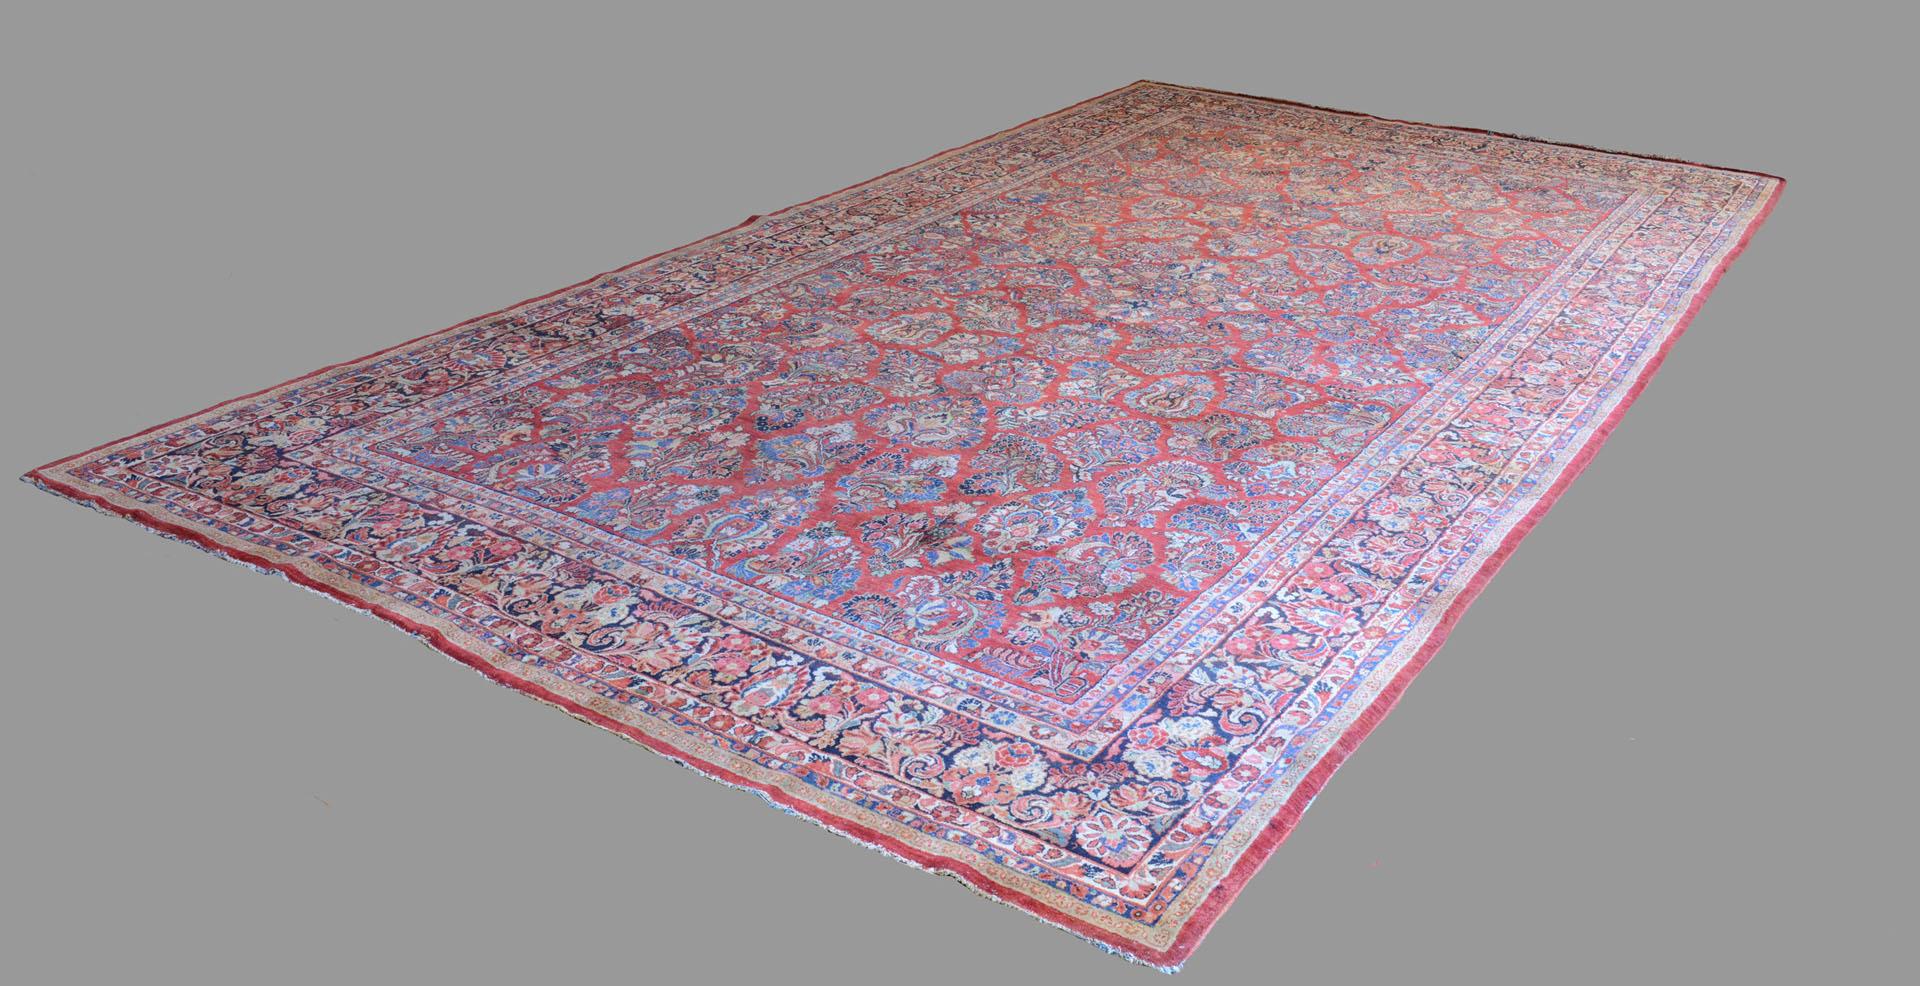 Lot 656: Semi-Antique Persian Sarouk Carpet